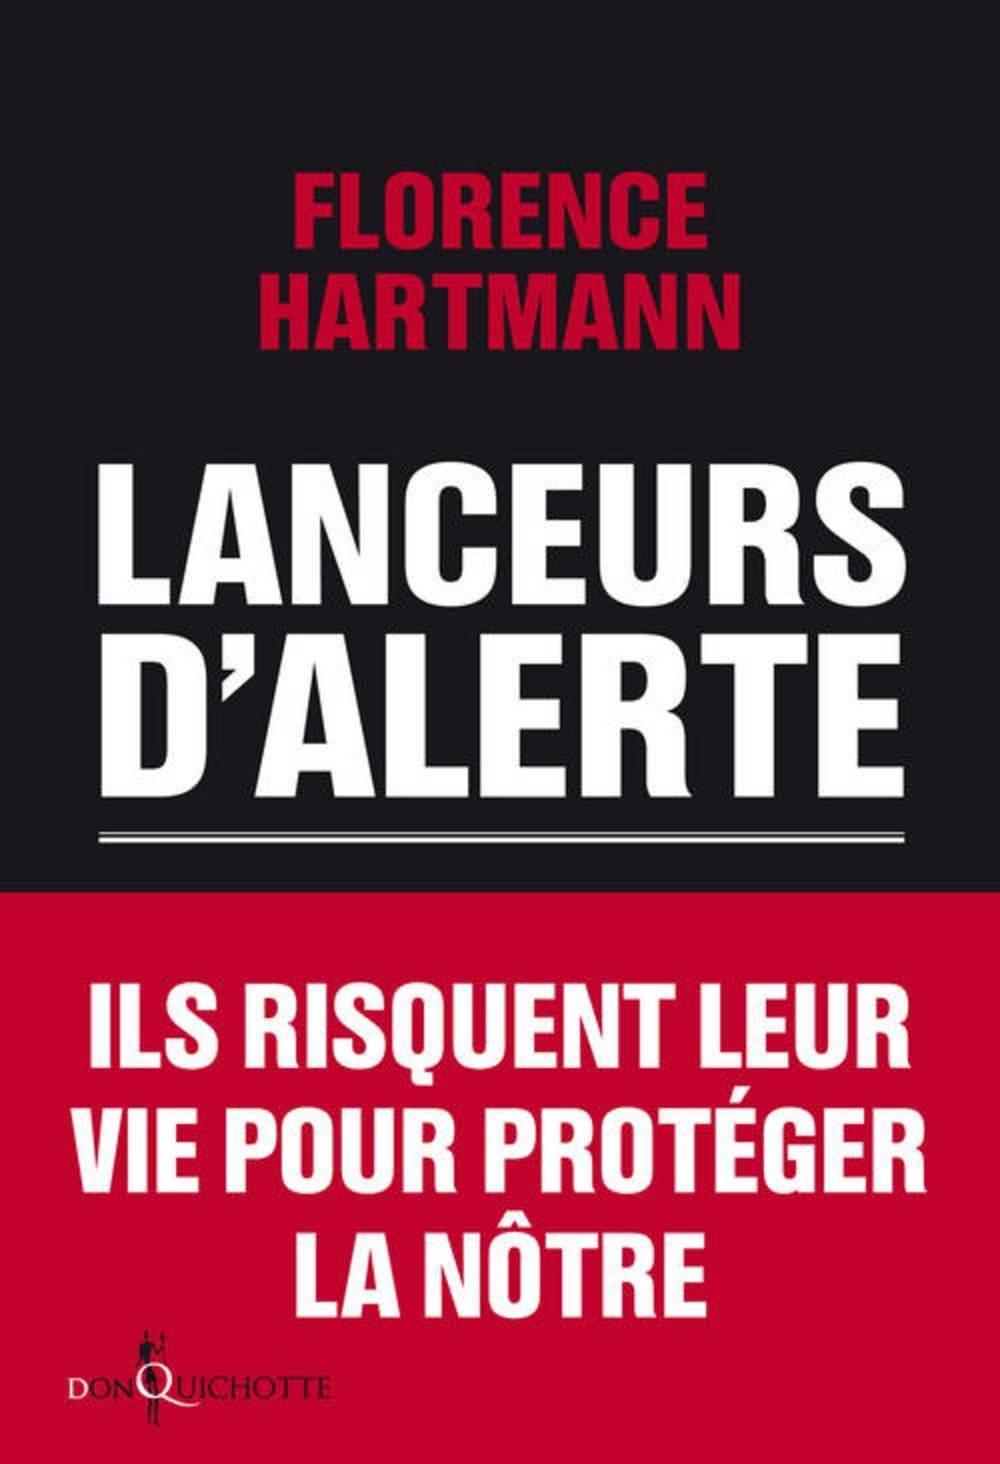 Hartmann_Lanceurs_dalerte.jpg